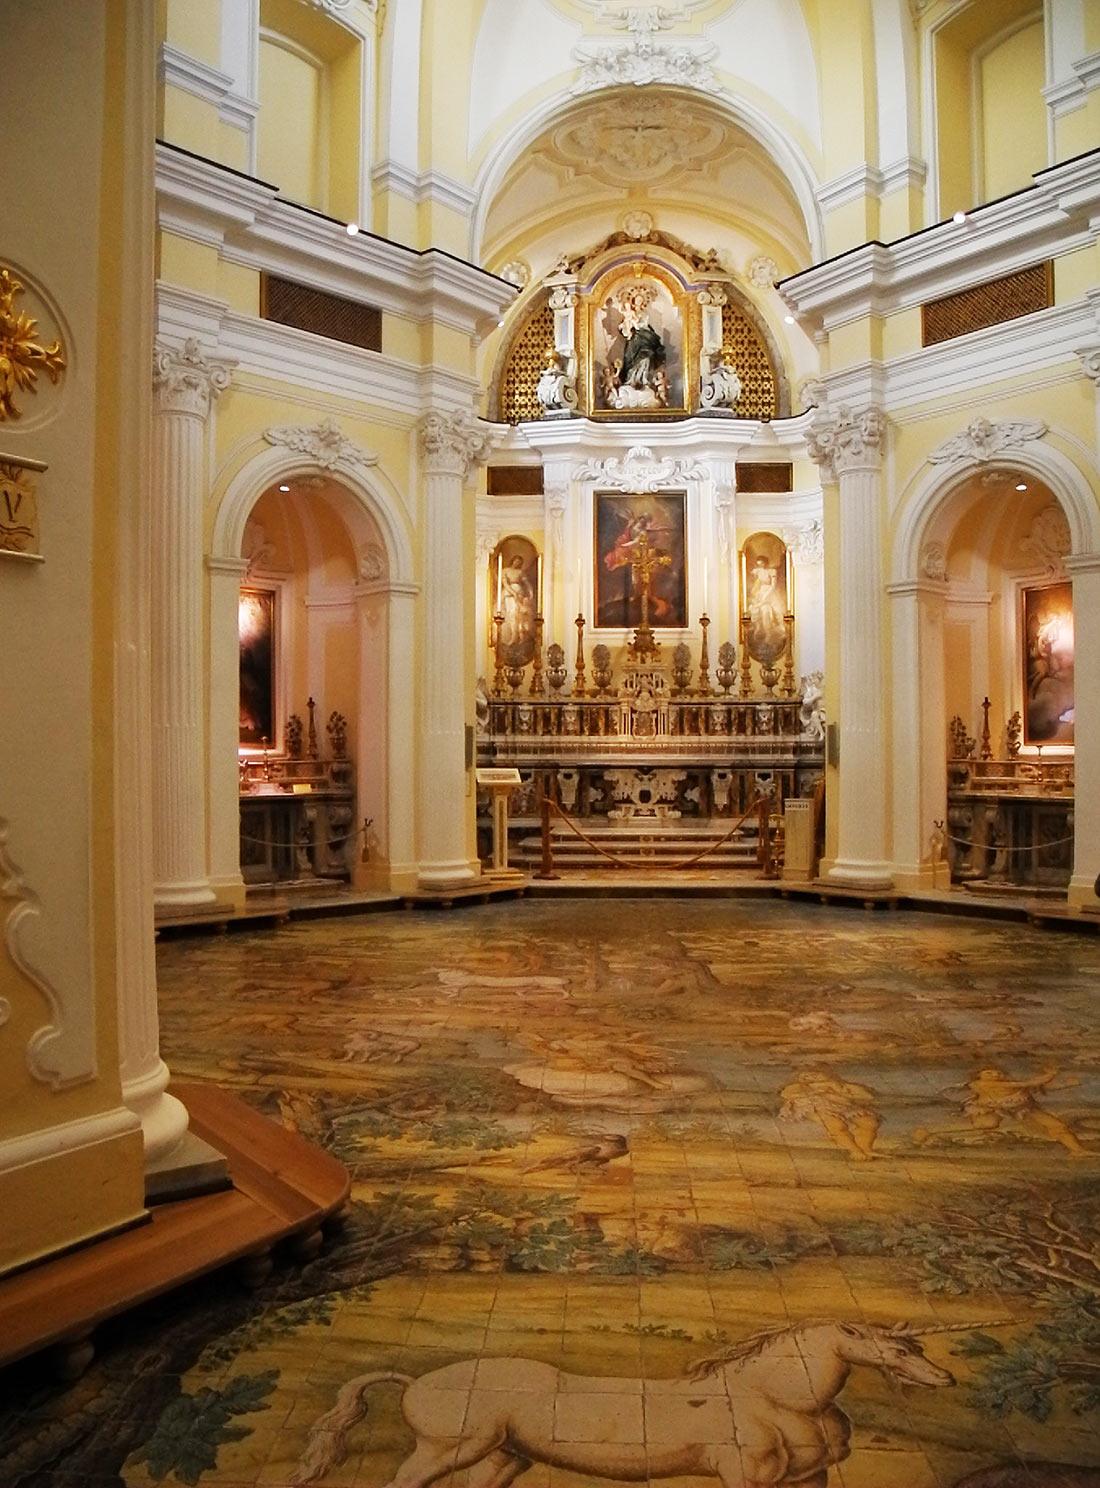 Interior of the church of San Michele, Anacapri